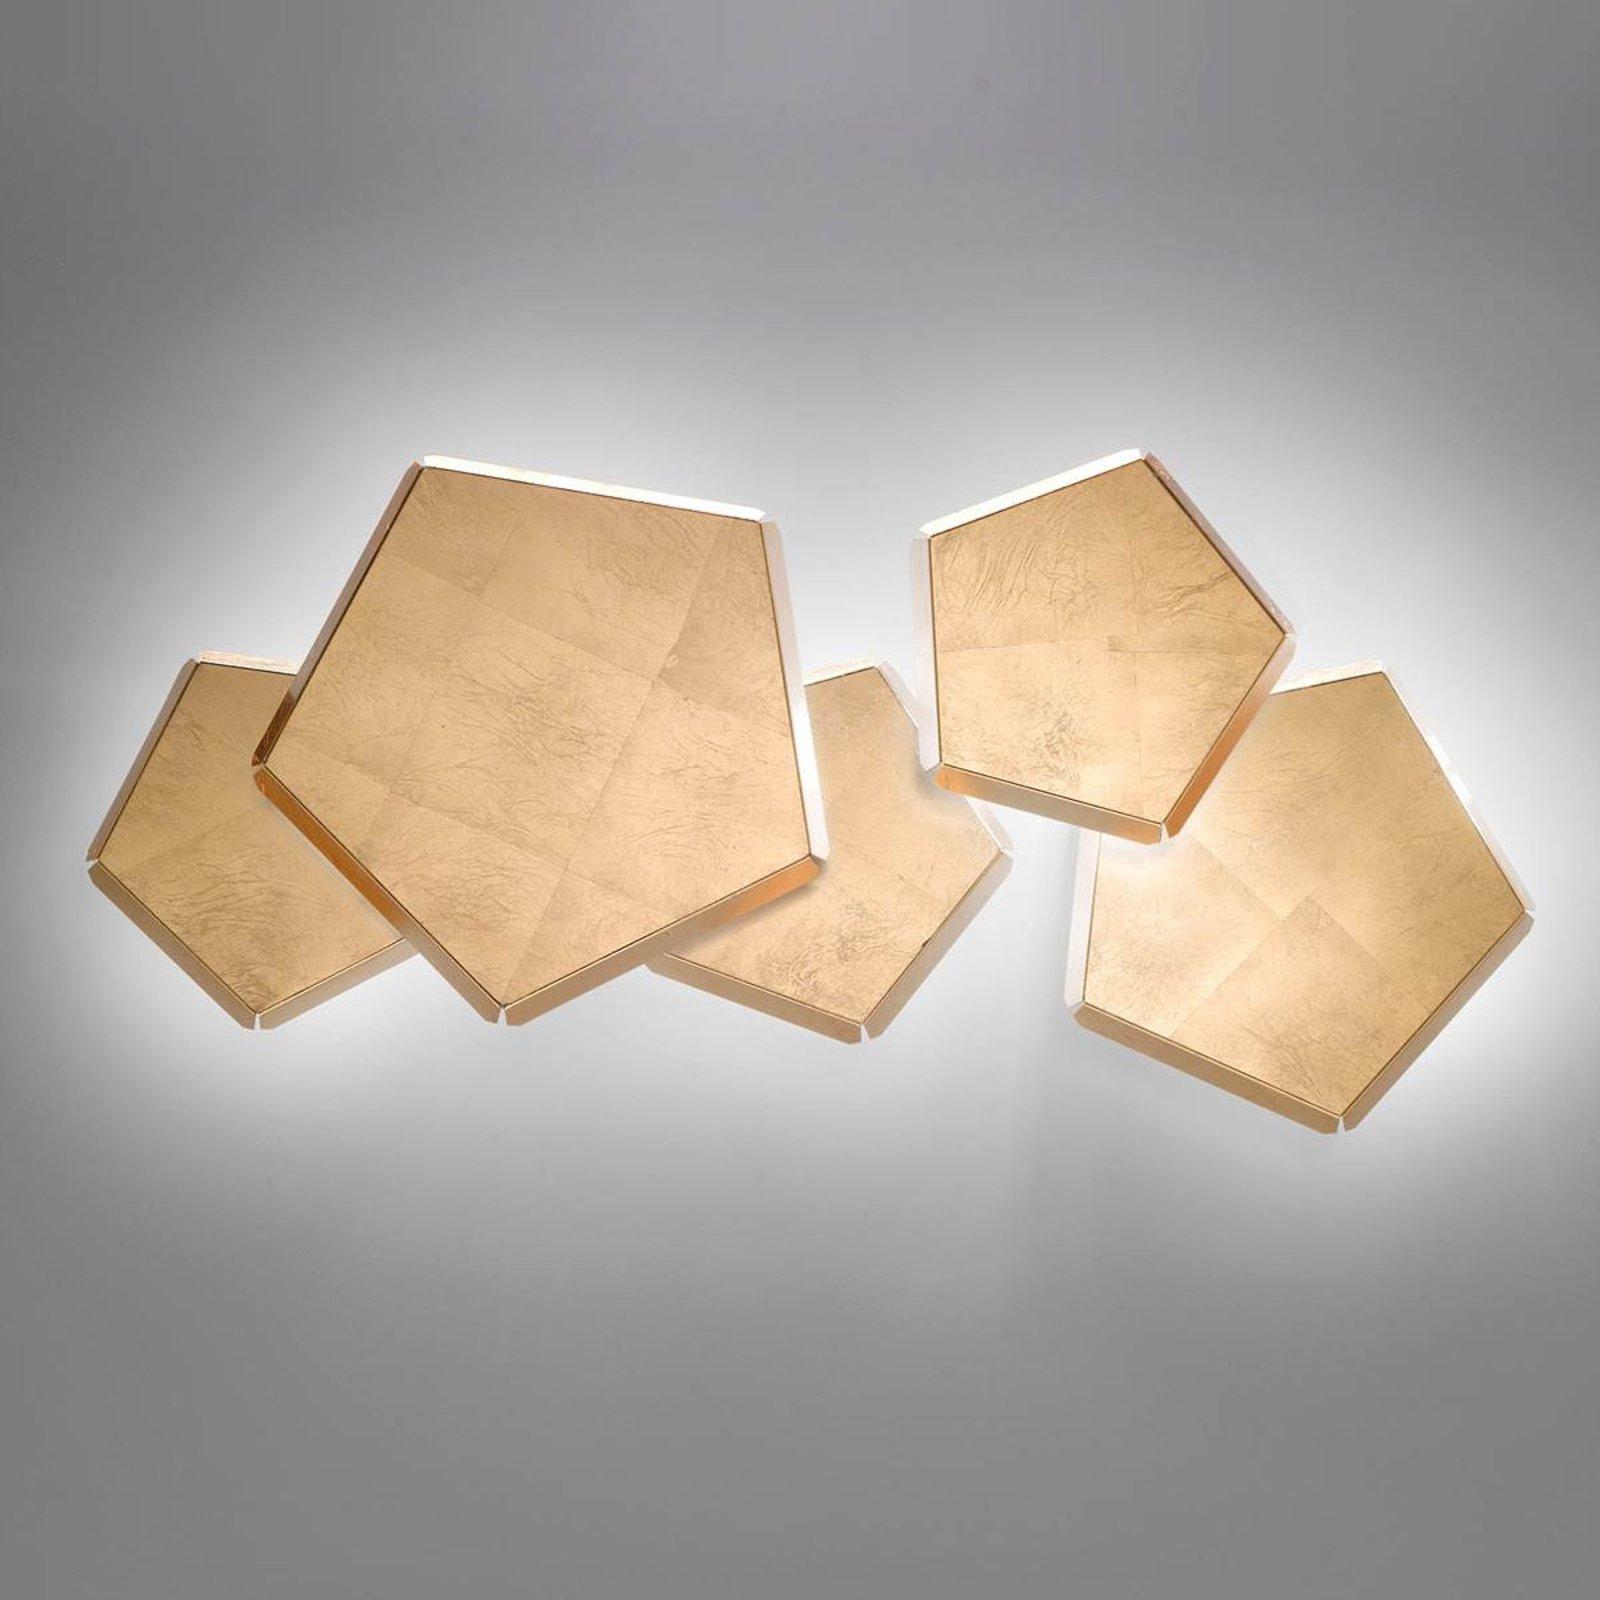 LED-vegglampe Pleiadi med gullblad, 5 lyskilder